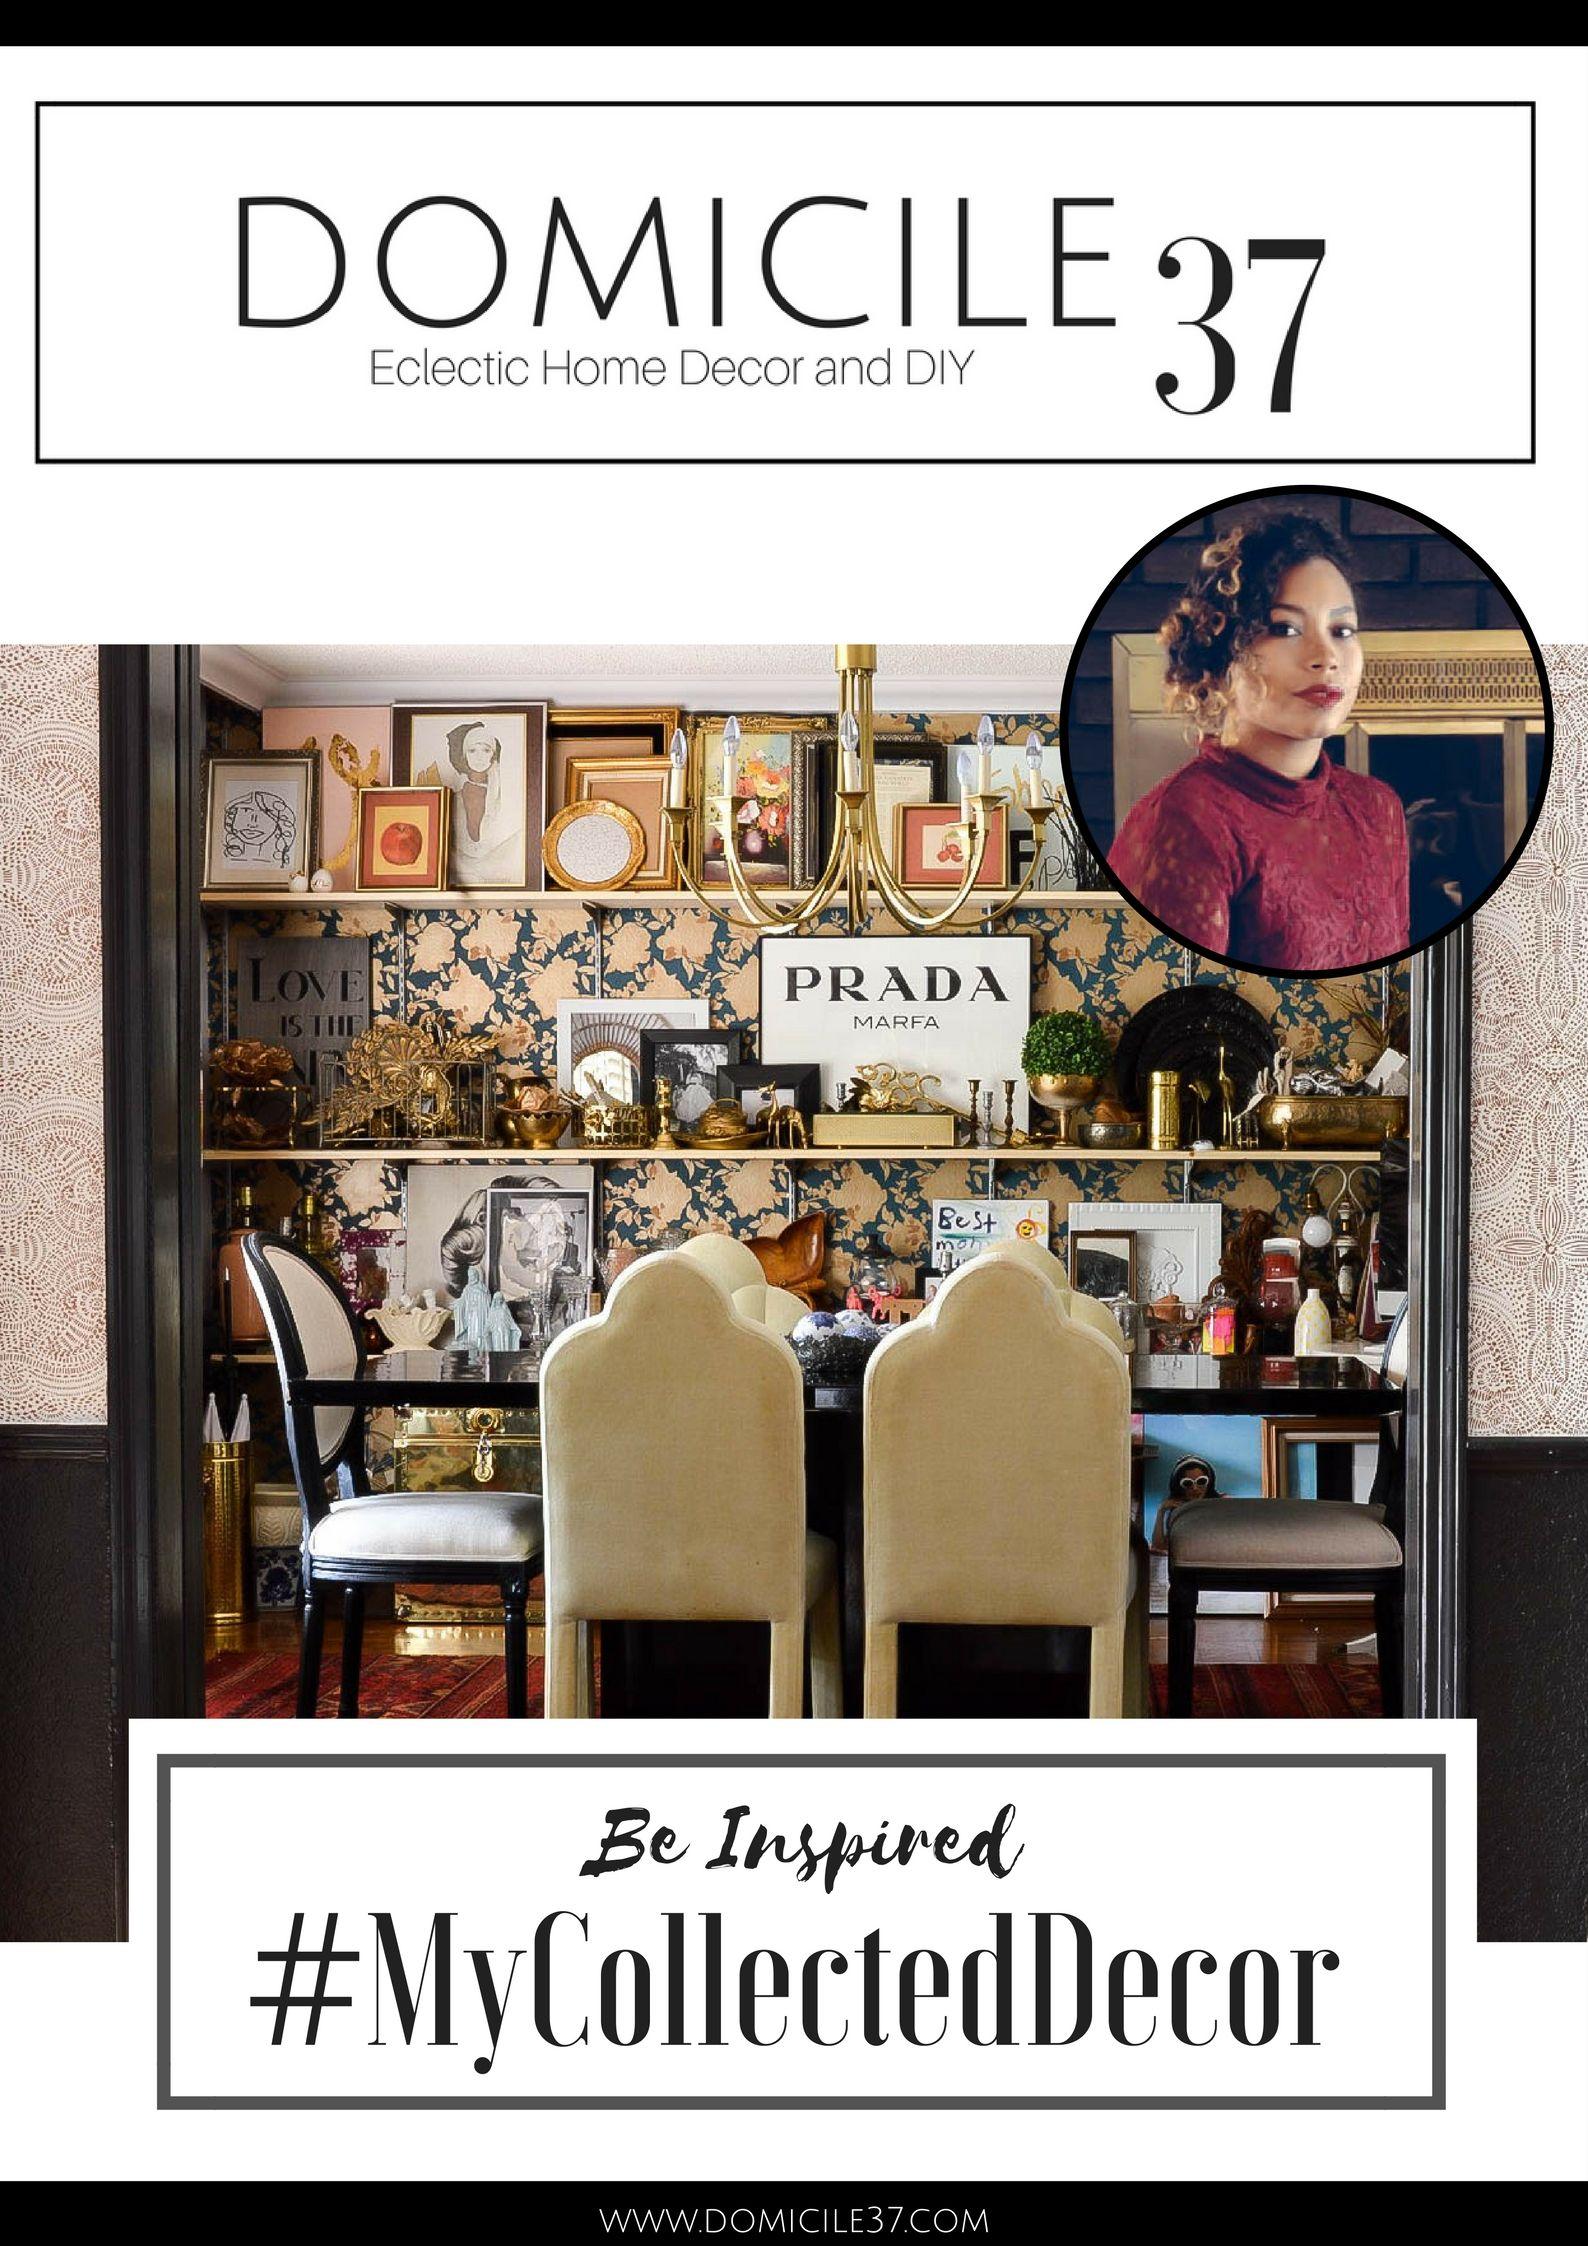 Interior design hashtag | #mycollecteddecor | eclectic decor | #eclecticdecor | #collecteddecor | Domicile 37